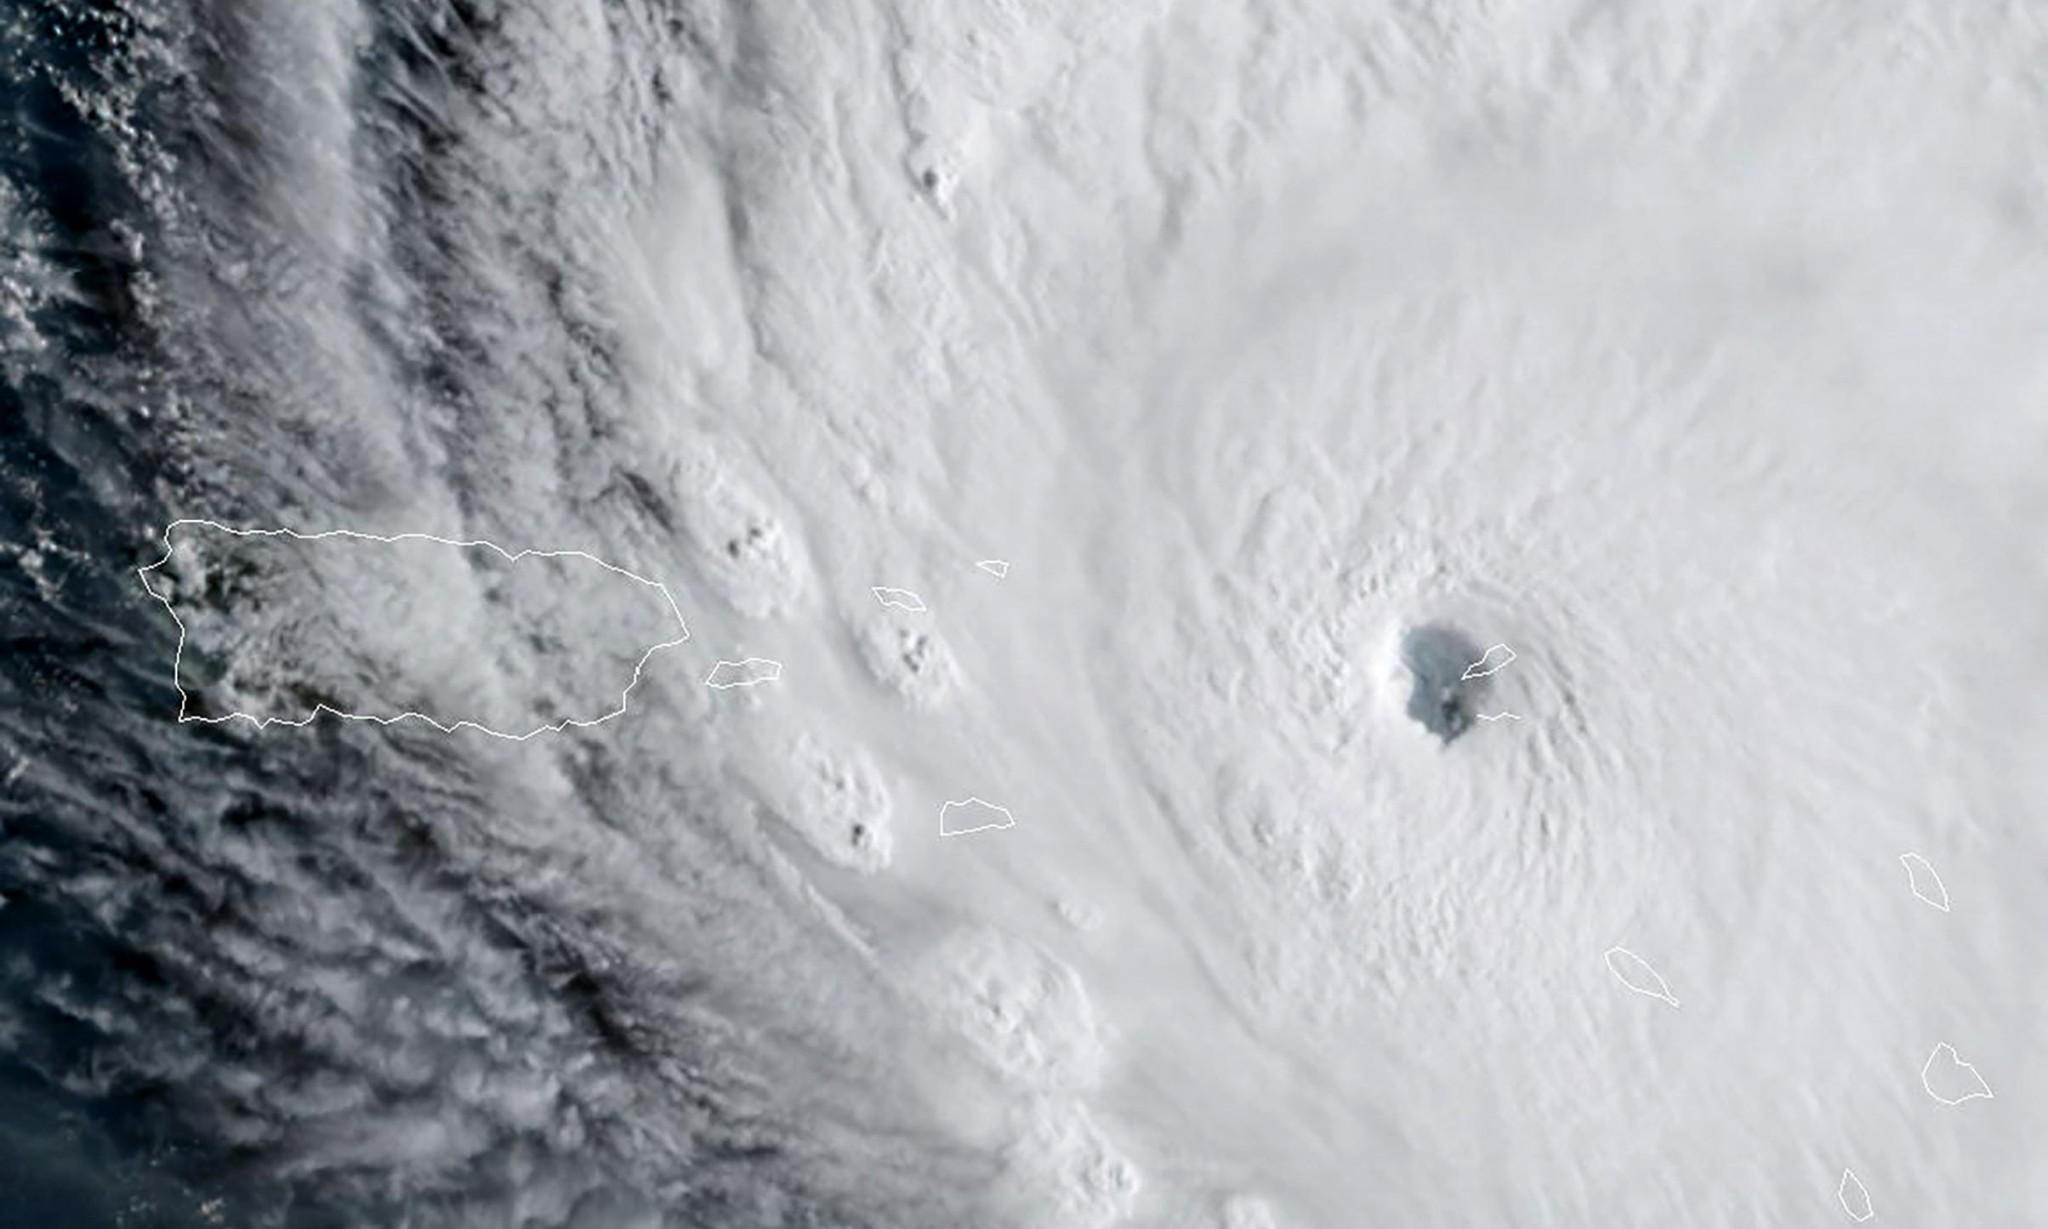 Death toll rises as 'apocalyptic' Irma wreaks havoc across Caribbean